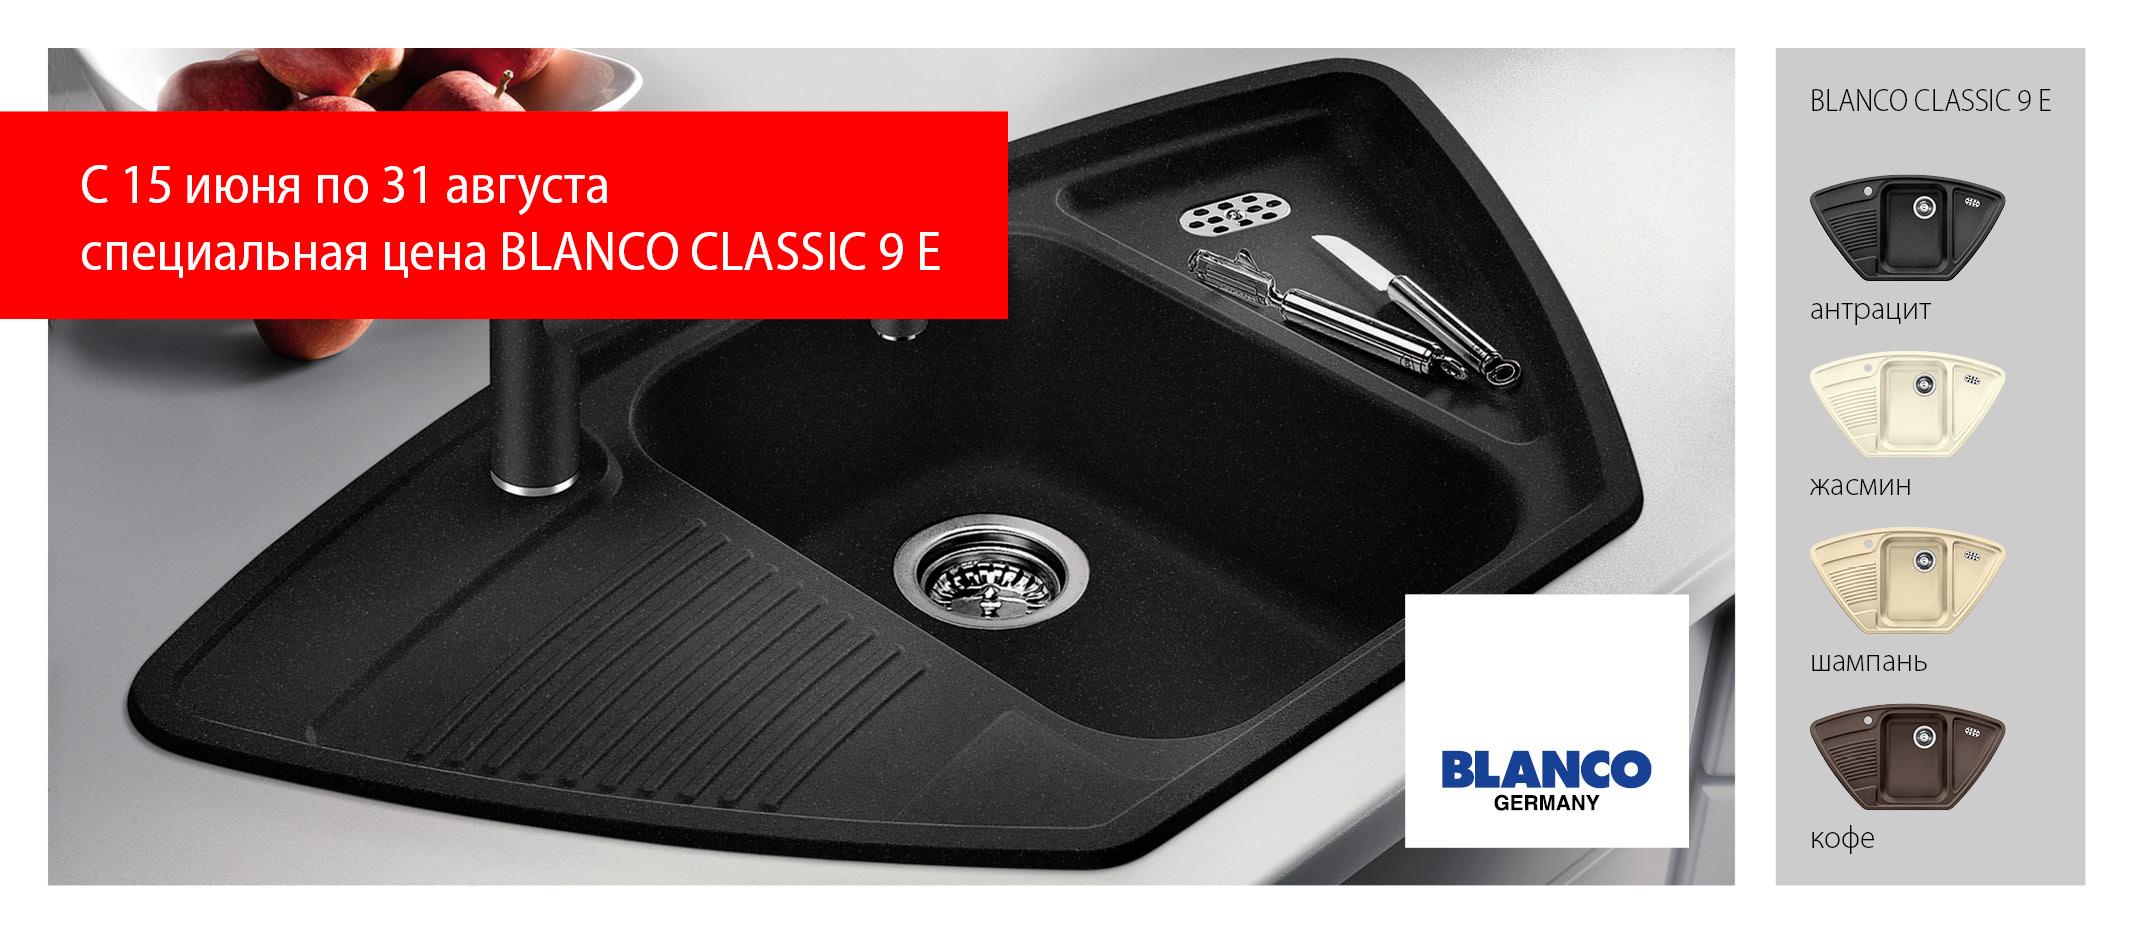 Смеситель Blanco CLASSIC 9E за 9900 рублей!